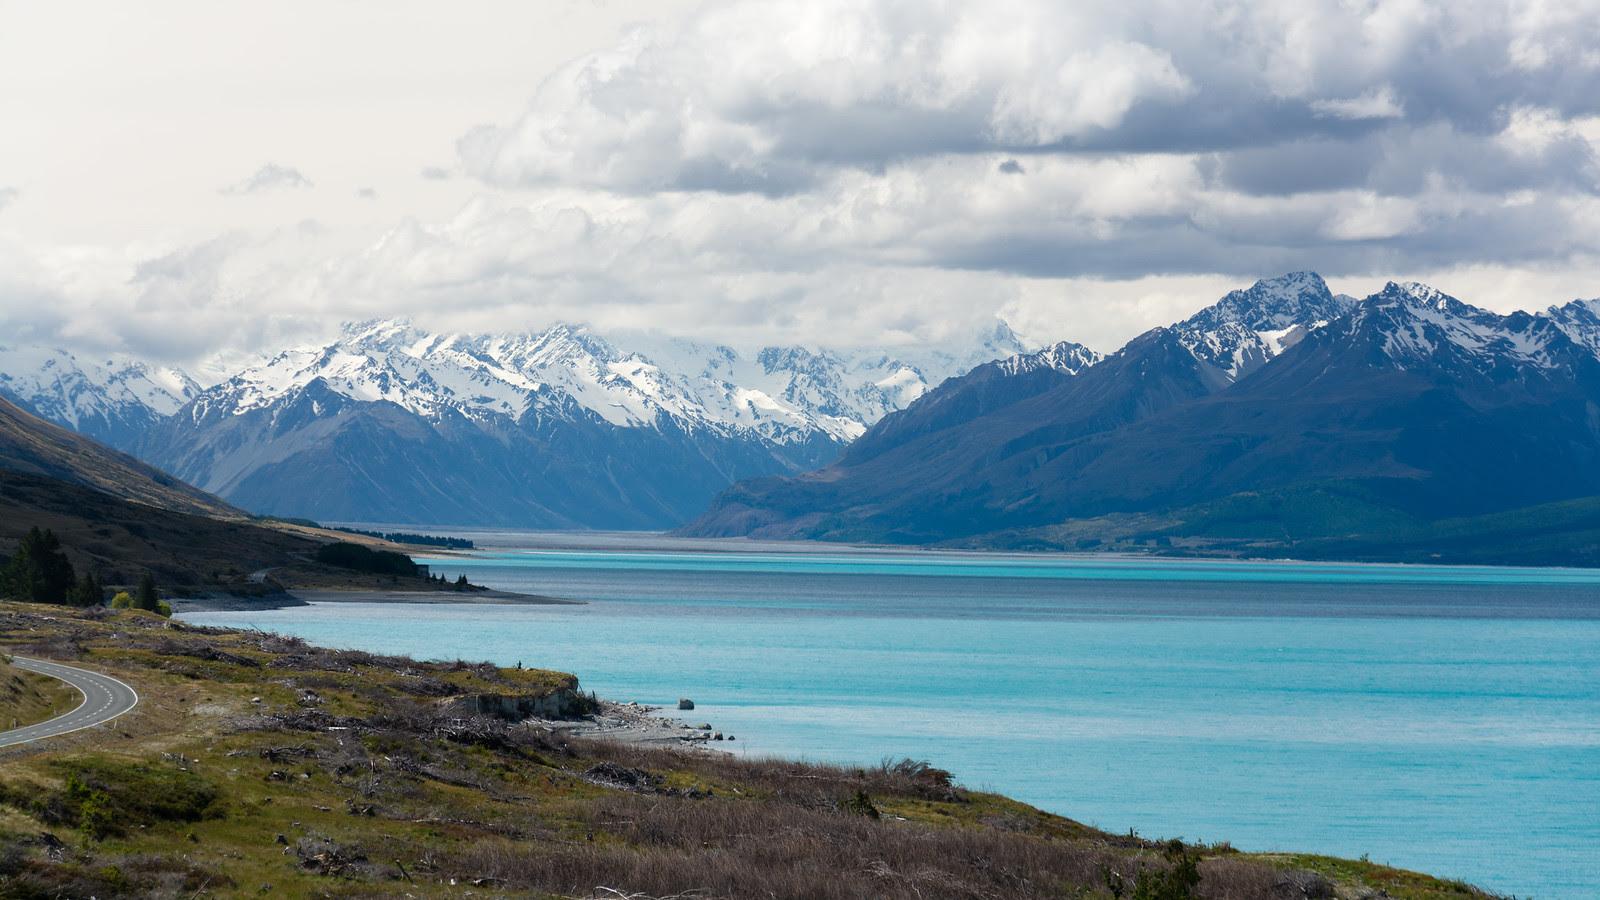 View toward Mount Cook, Lake Pukaki